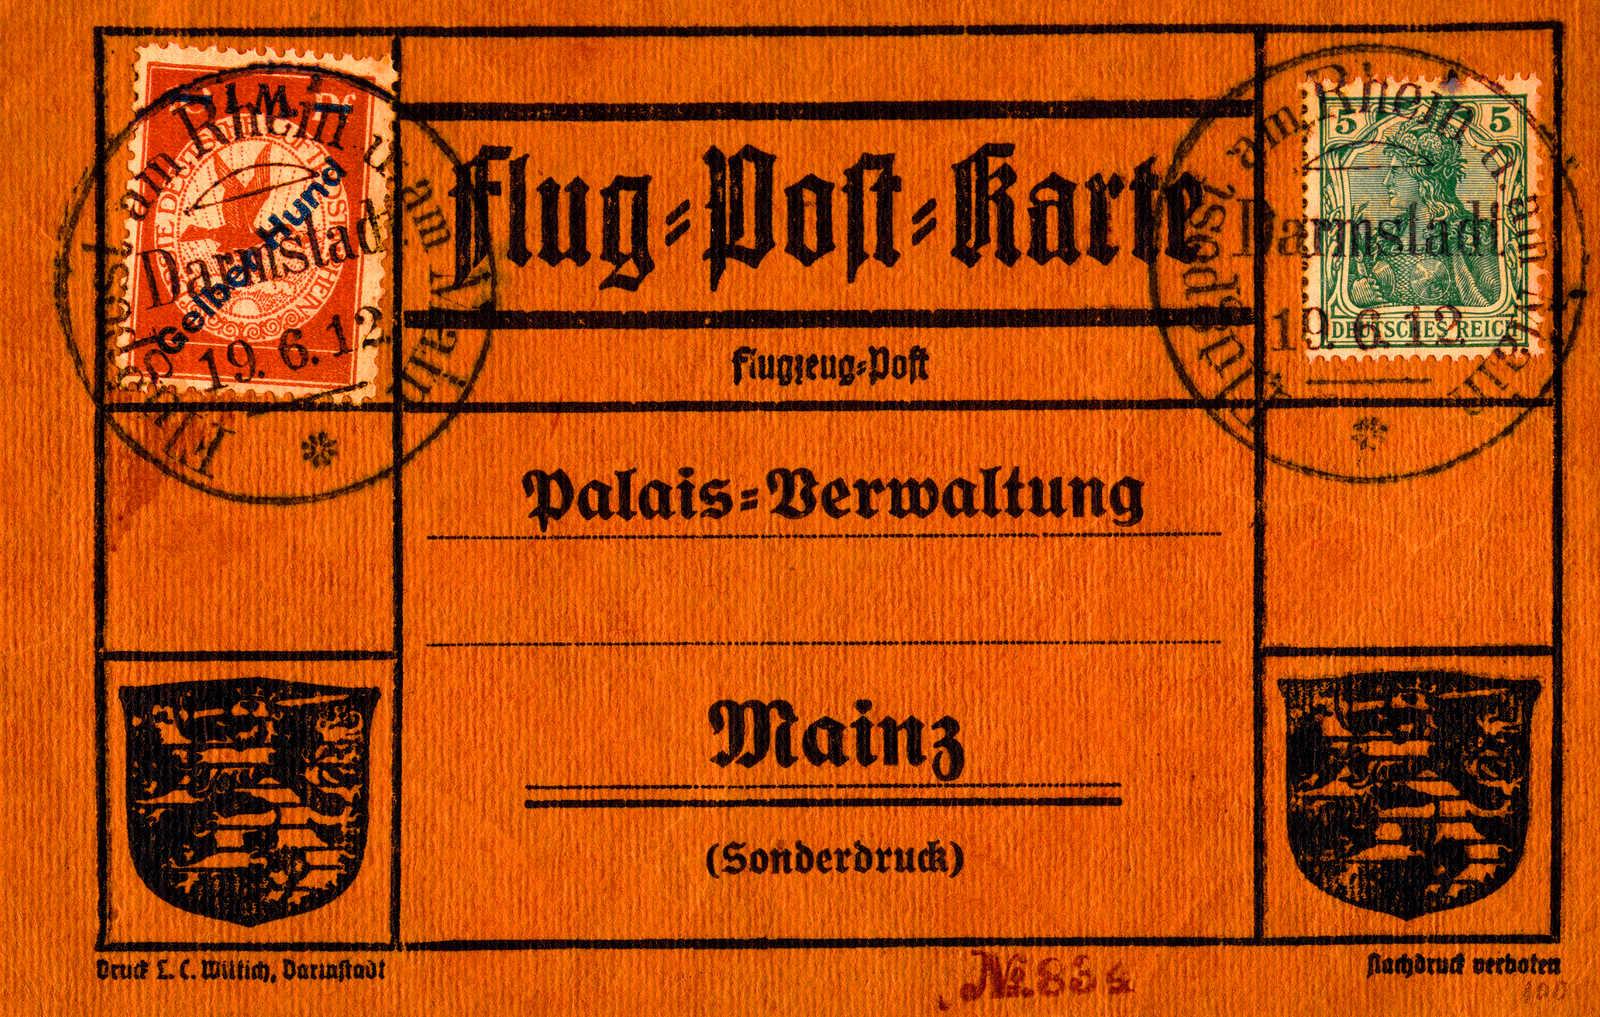 Lot 10026 - germany German Empire -  classicphil GmbH 3 rd classicphil Auction - VIENNA- AUSTRIA